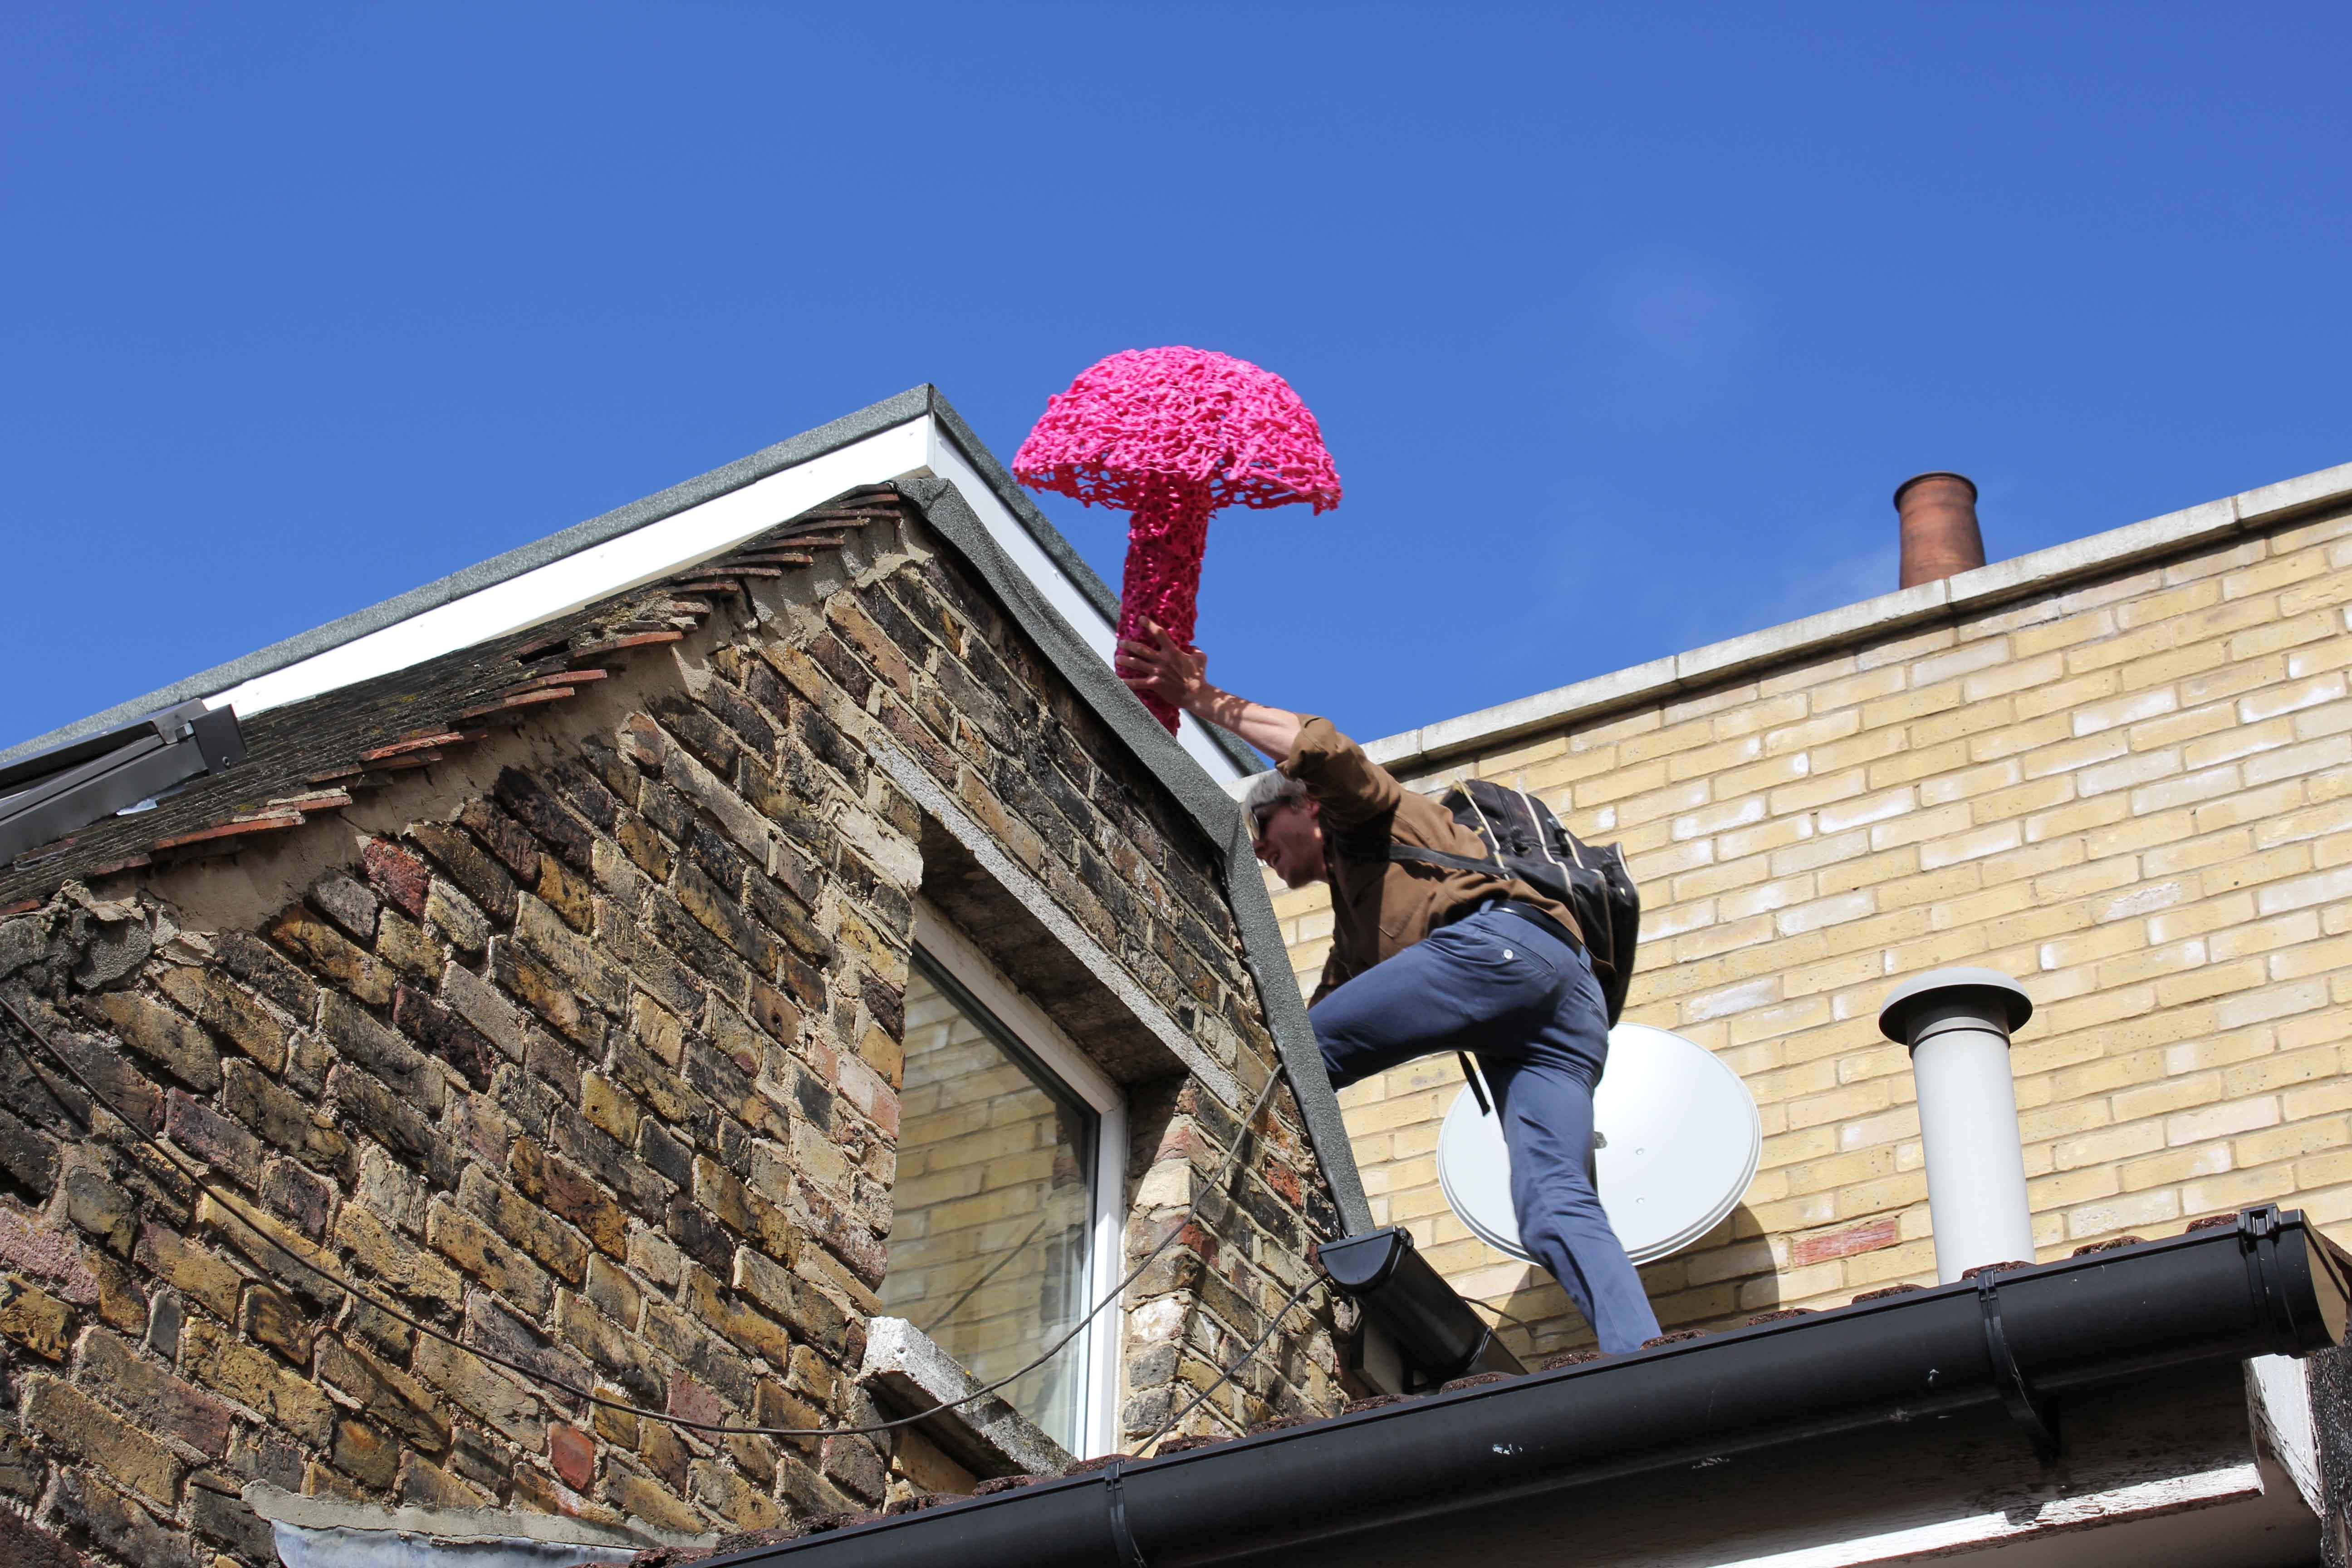 Climbing roof The Mega Mushroom